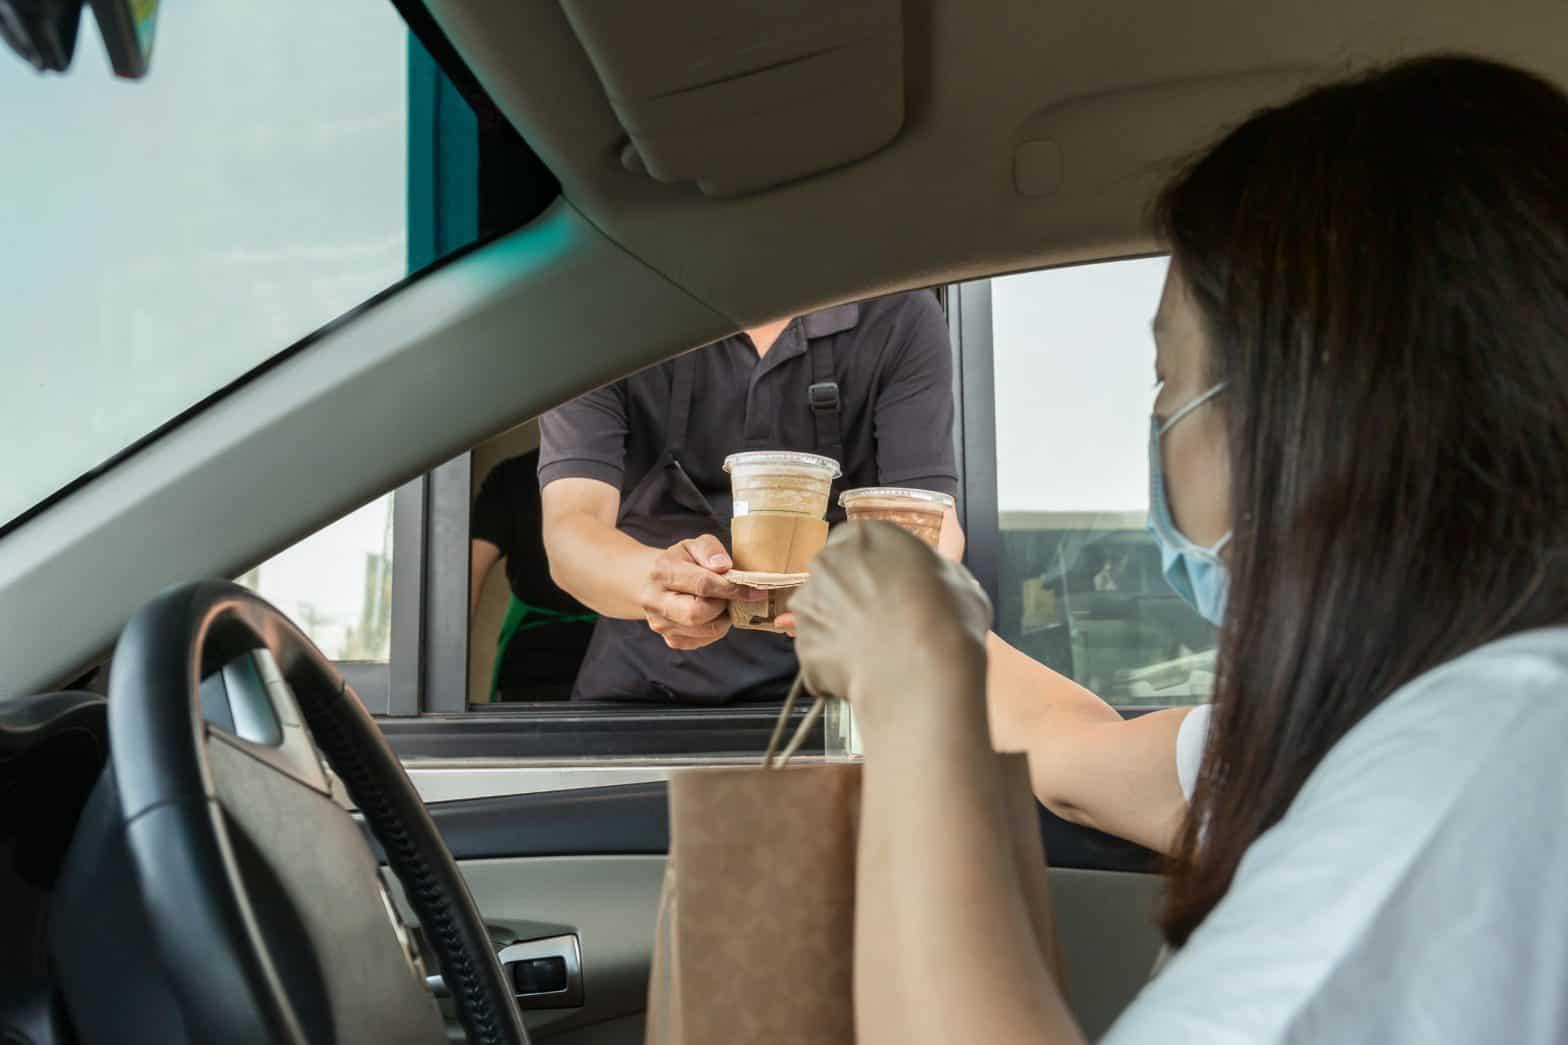 woman getting food through drive thru window